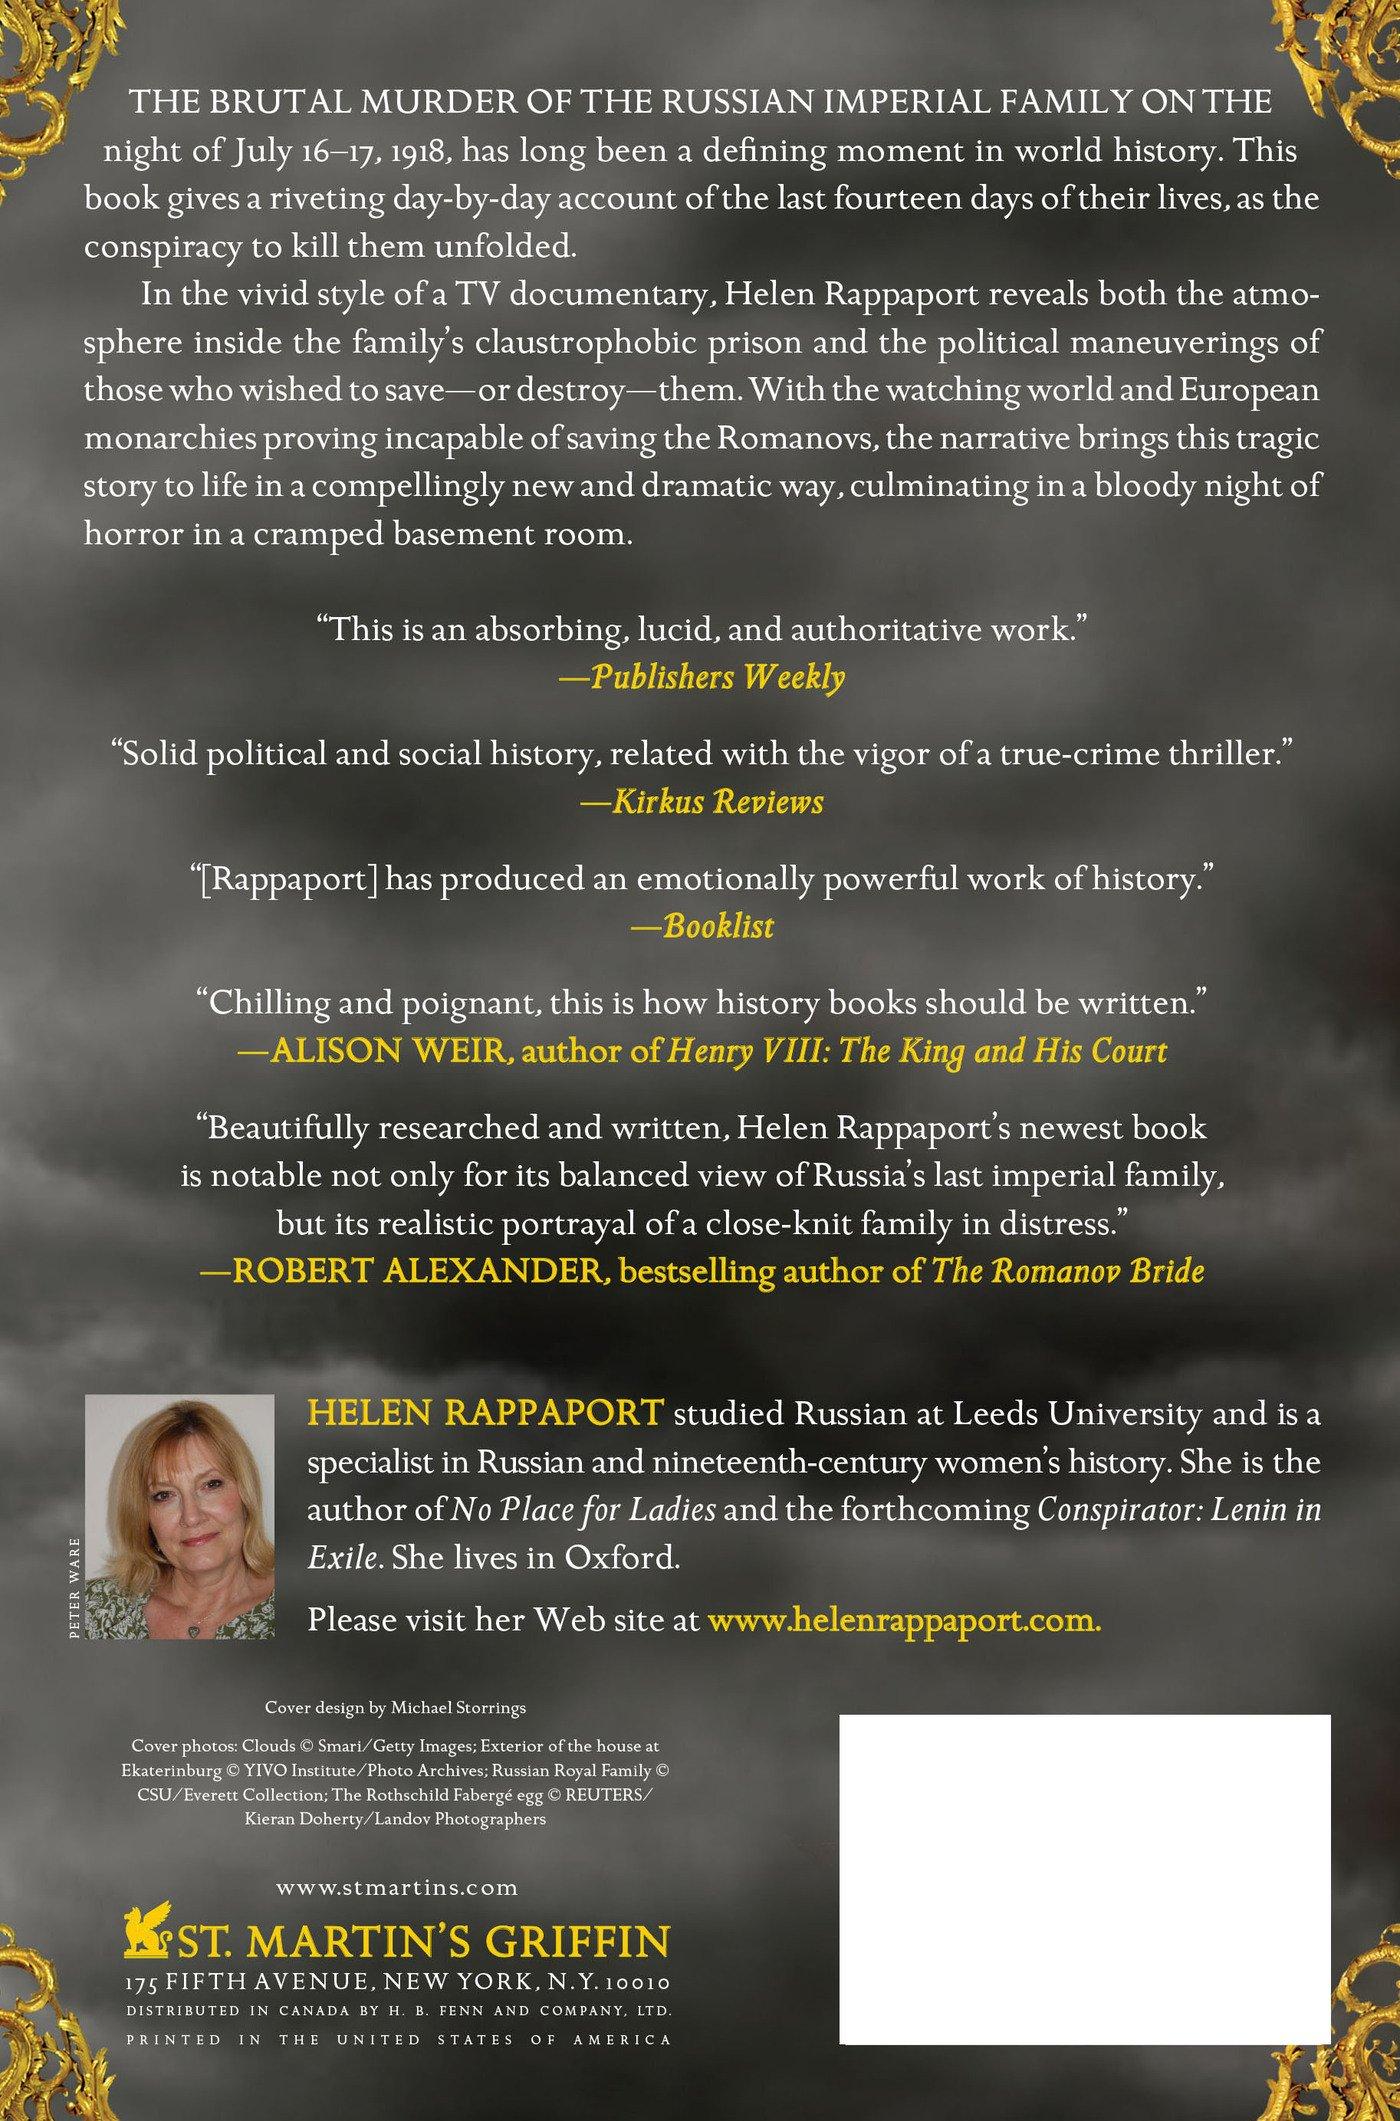 Amazon: The Last Days Of The Romanovs: Tragedy At Ekaterinburg  (9780312603472): Helen Rappaport: Books